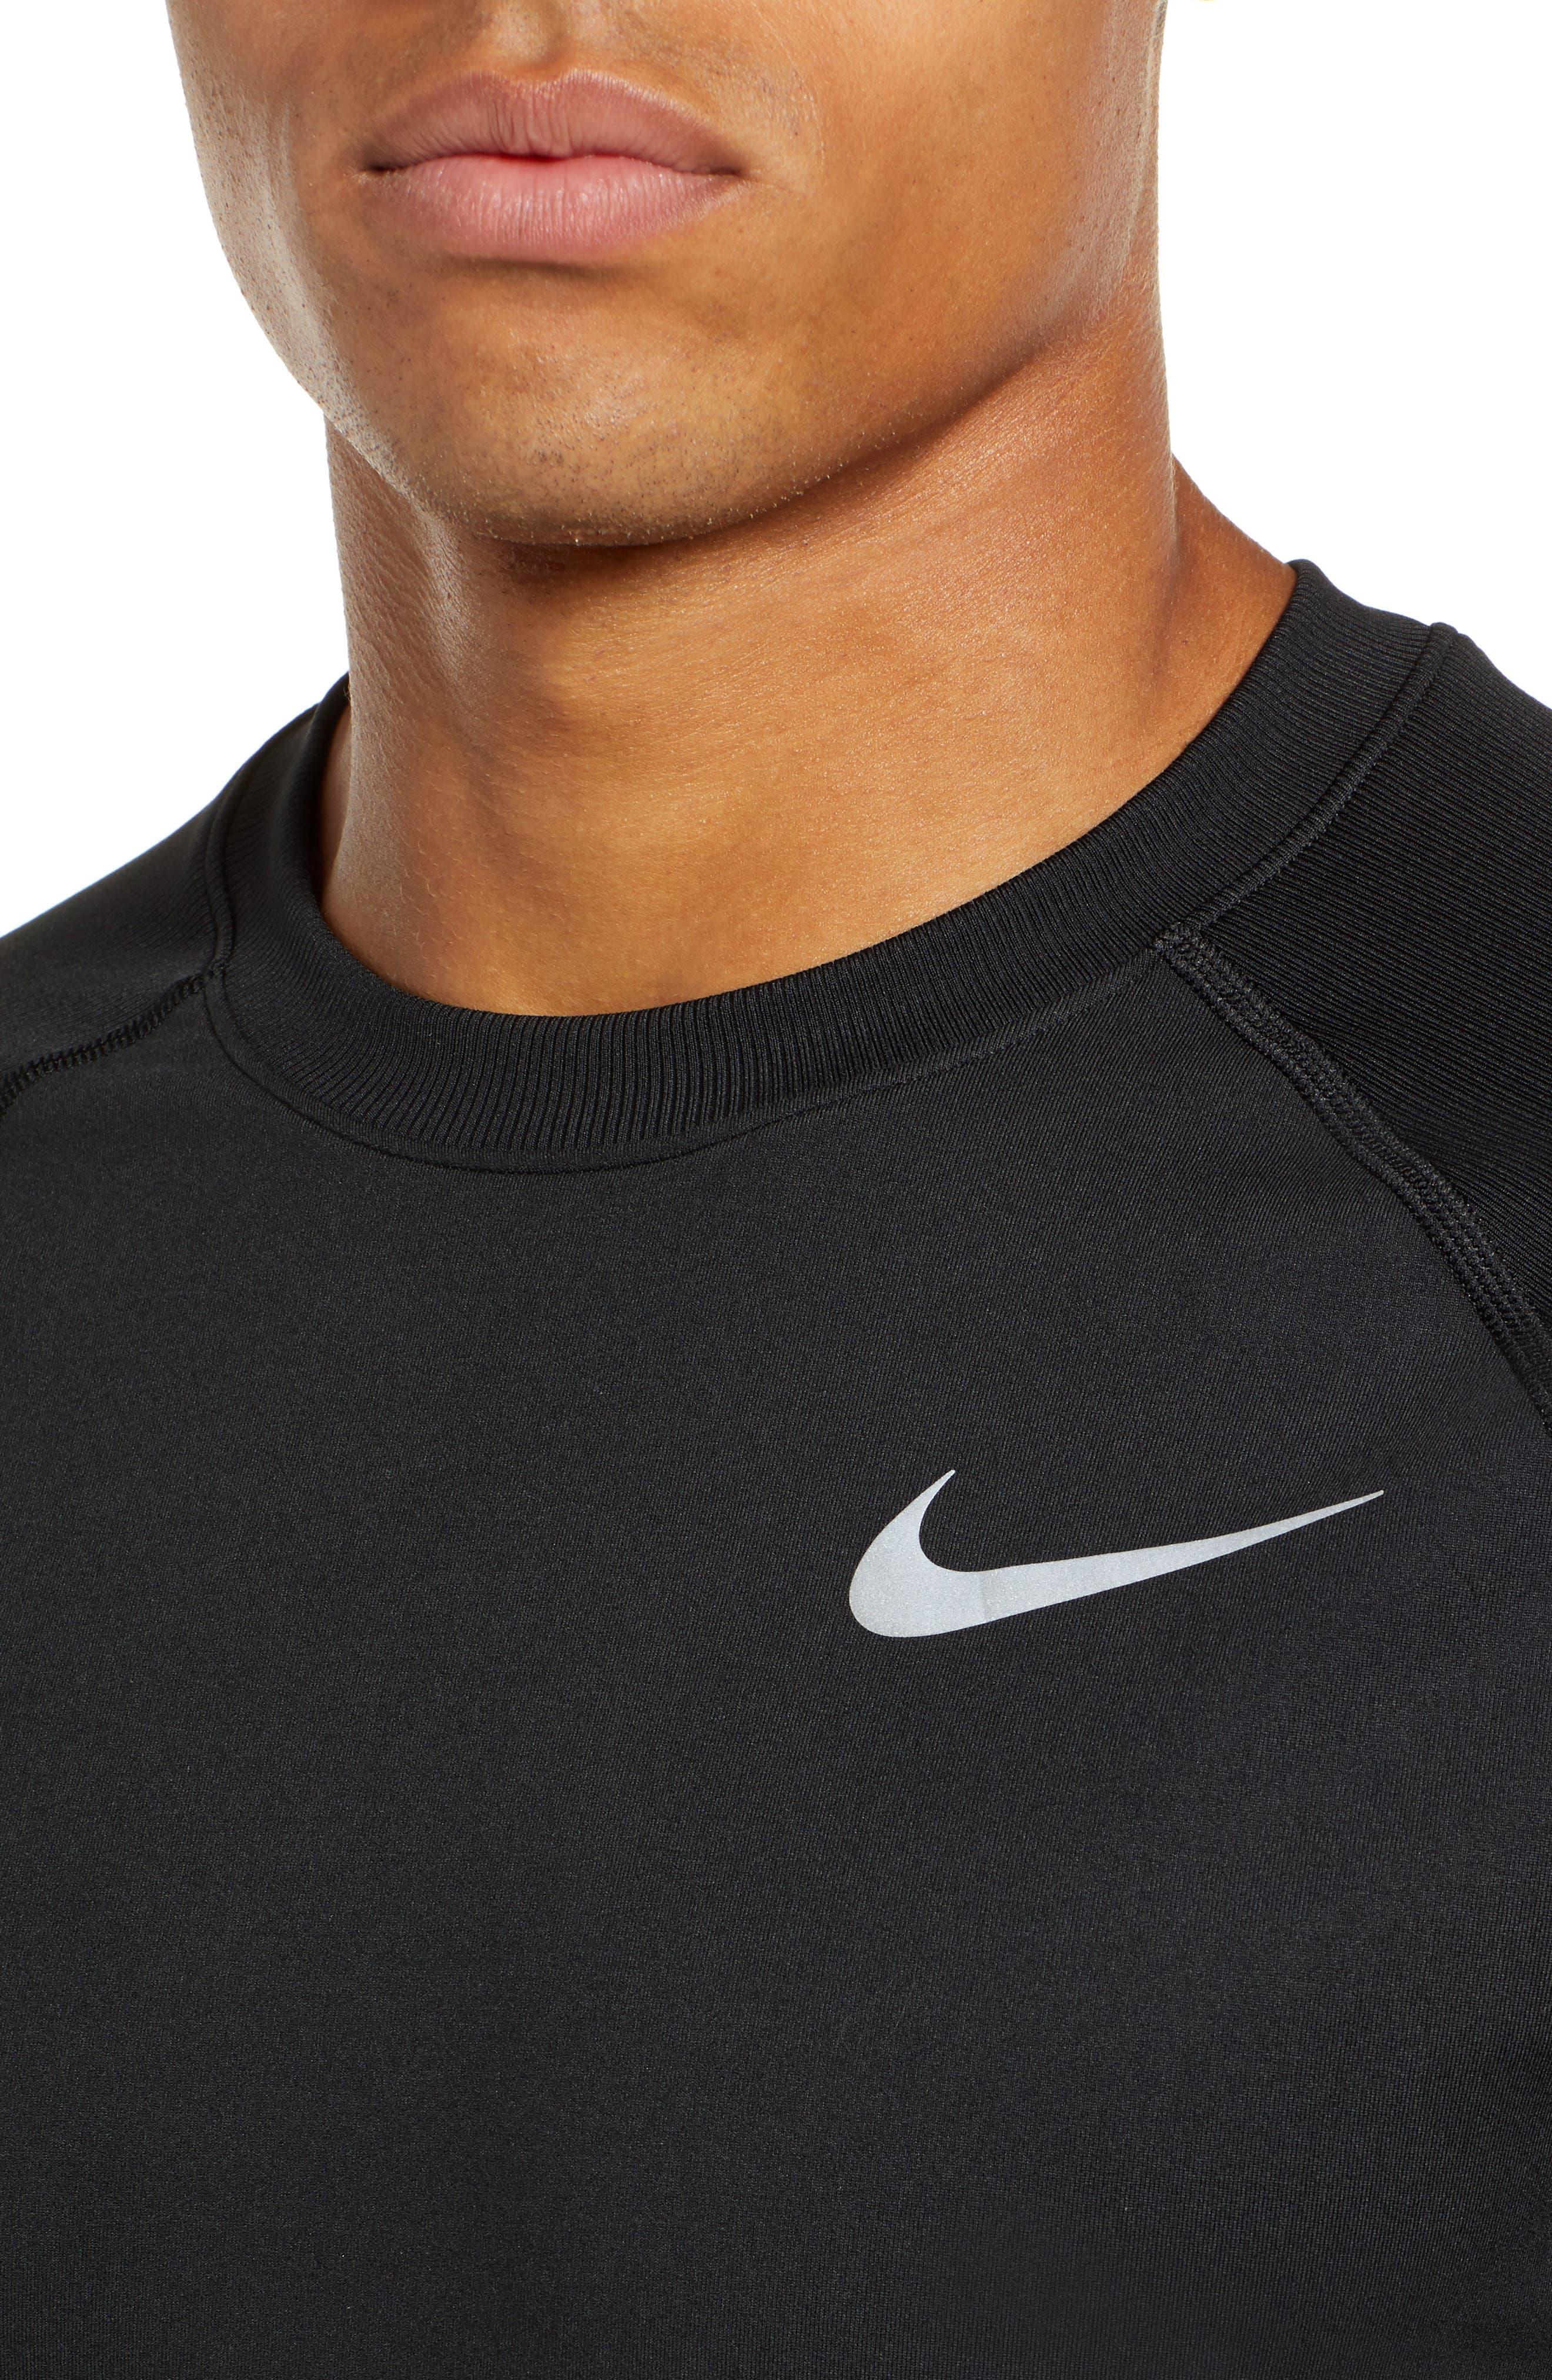 NIKE,                             Element Dry Crewneck Running T-Shirt,                             Alternate thumbnail 4, color,                             BLACK